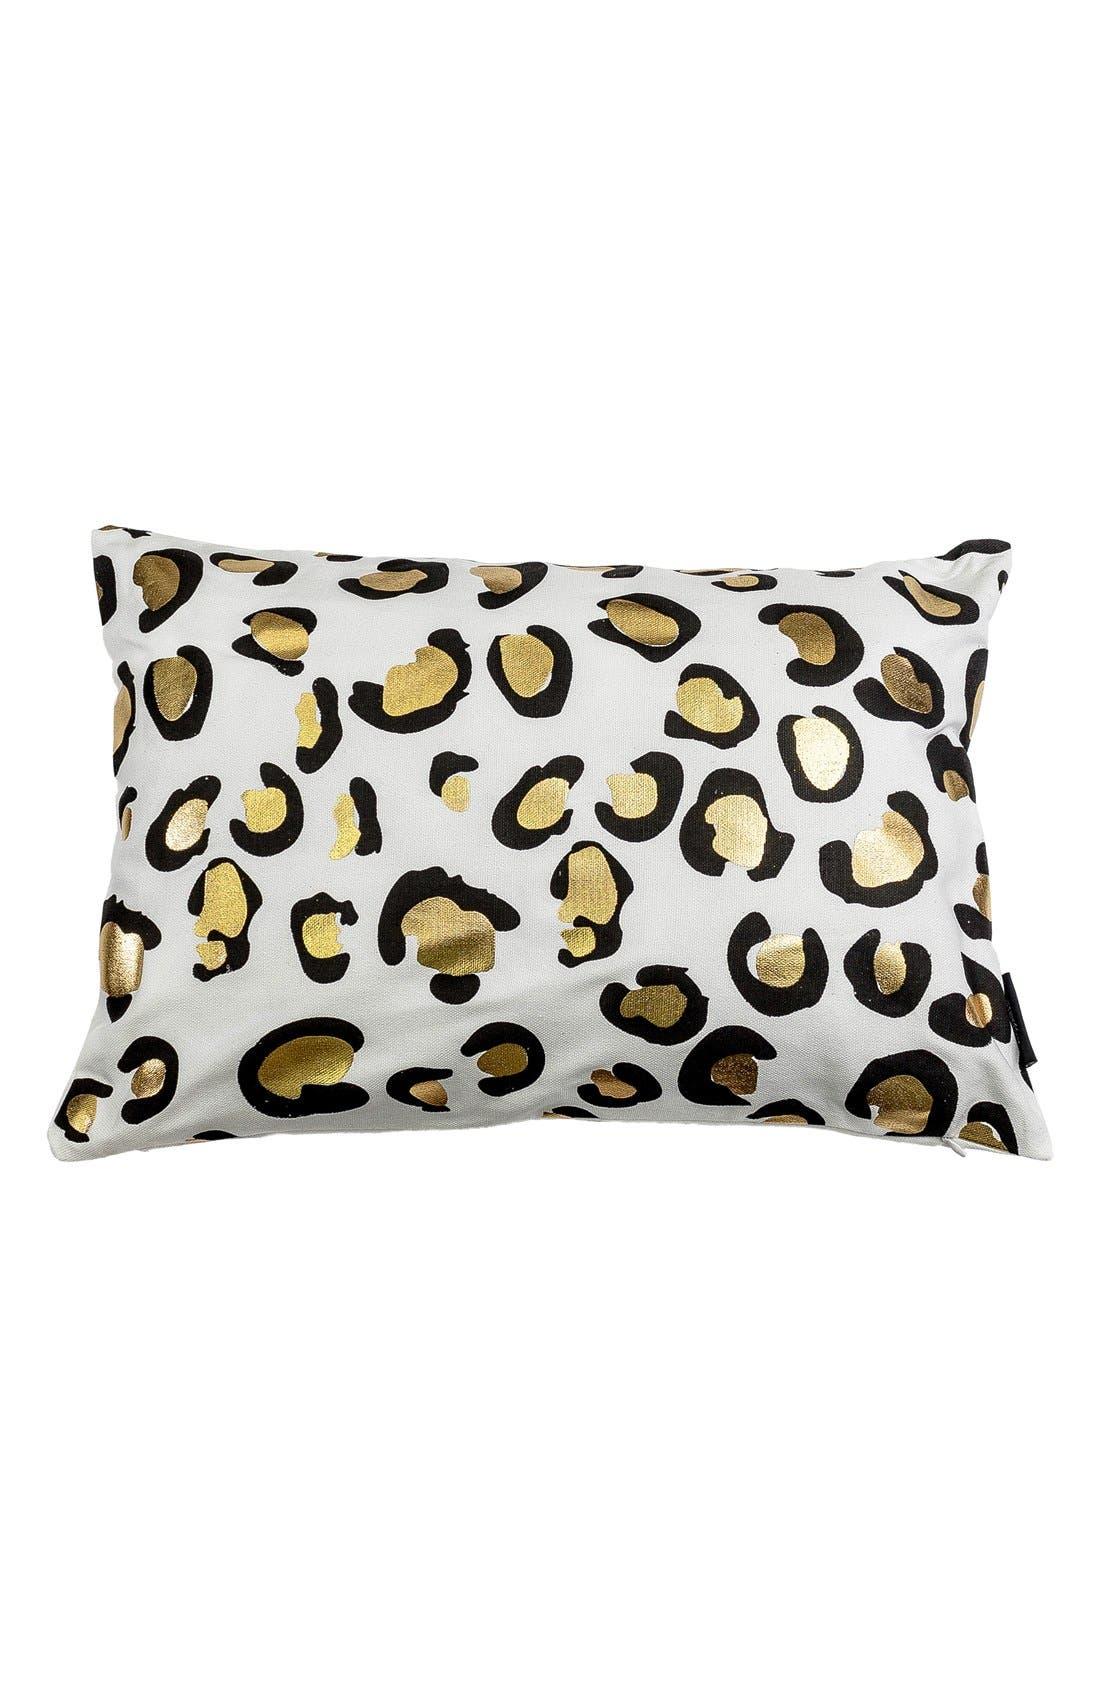 Metallic Animal Print Pillow,                             Main thumbnail 1, color,                             White/ Gold Multi